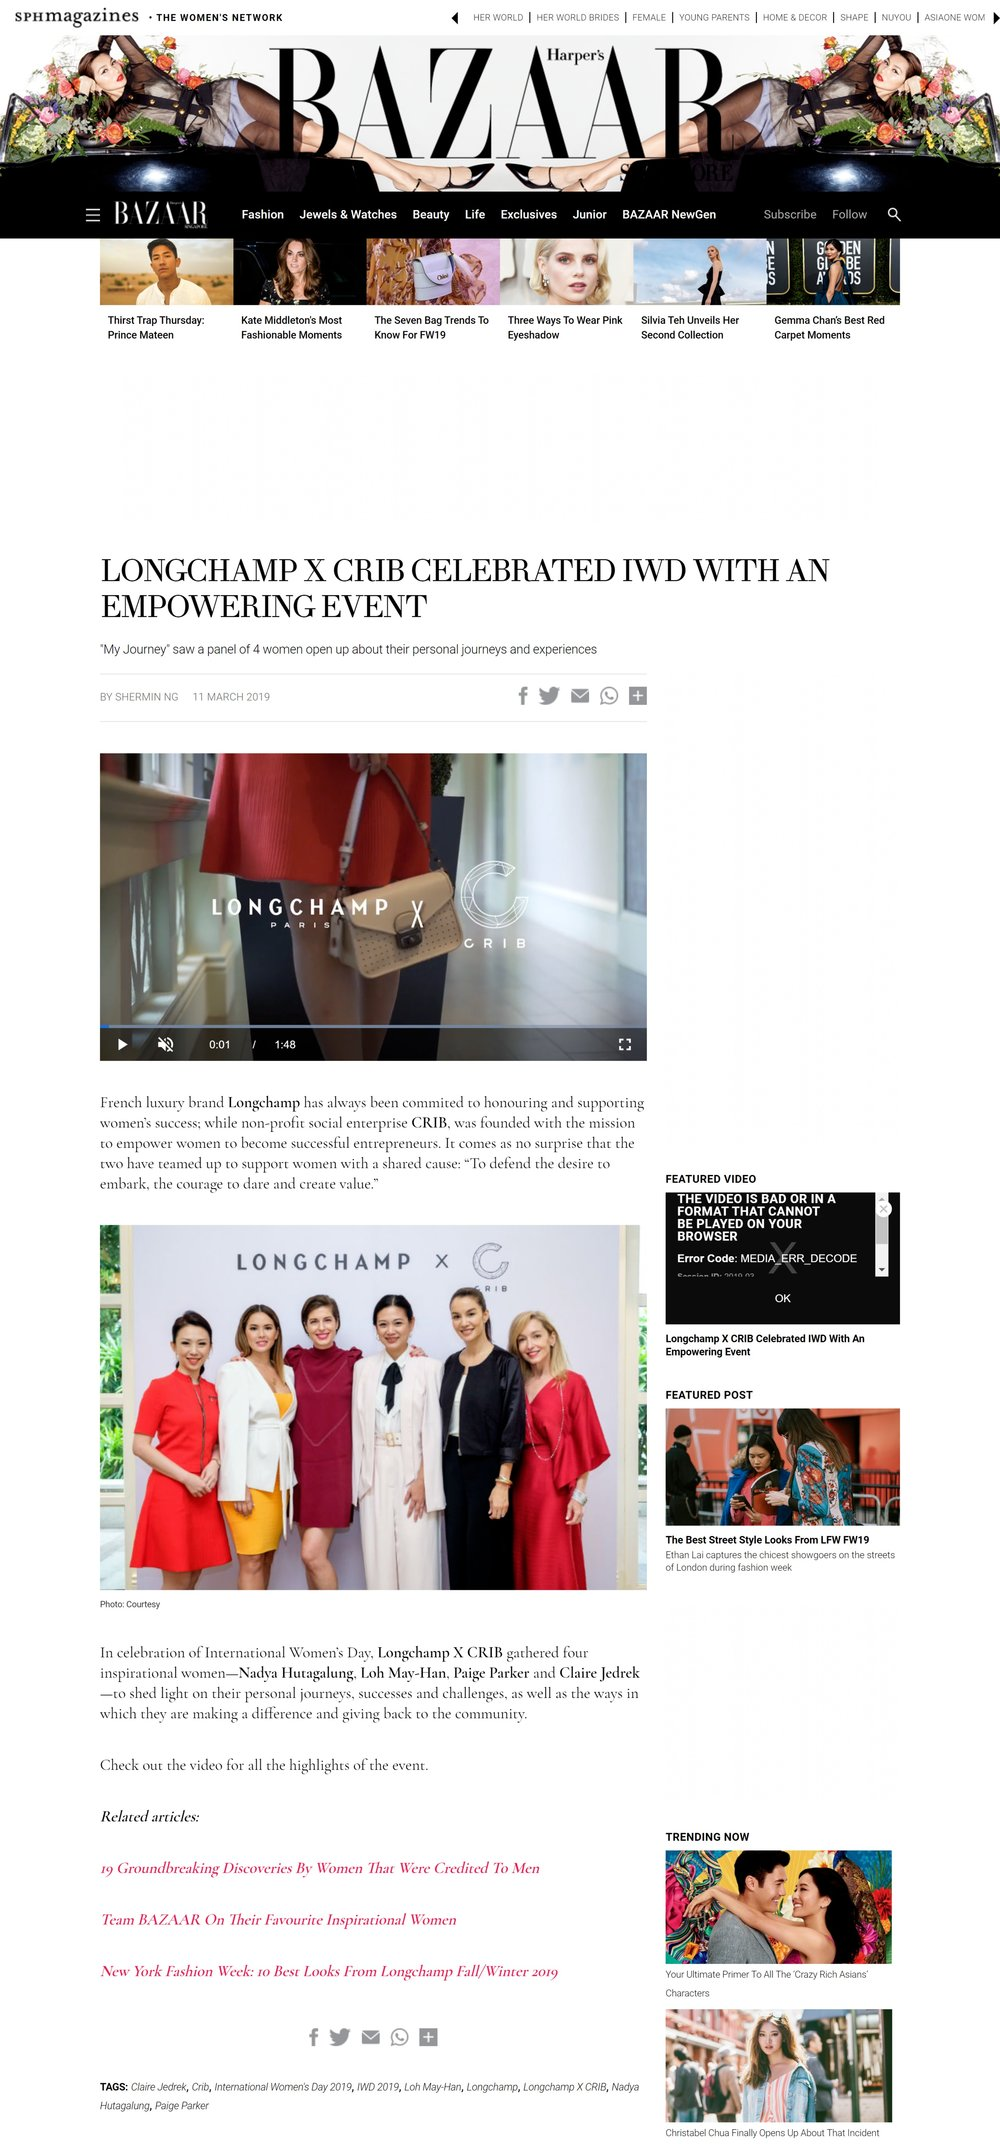 screencapture-harpersbazaar-sg-life-longchamp-crib-iwd-empowering-event-2019-03-26-14_44_16+%281%29.jpg